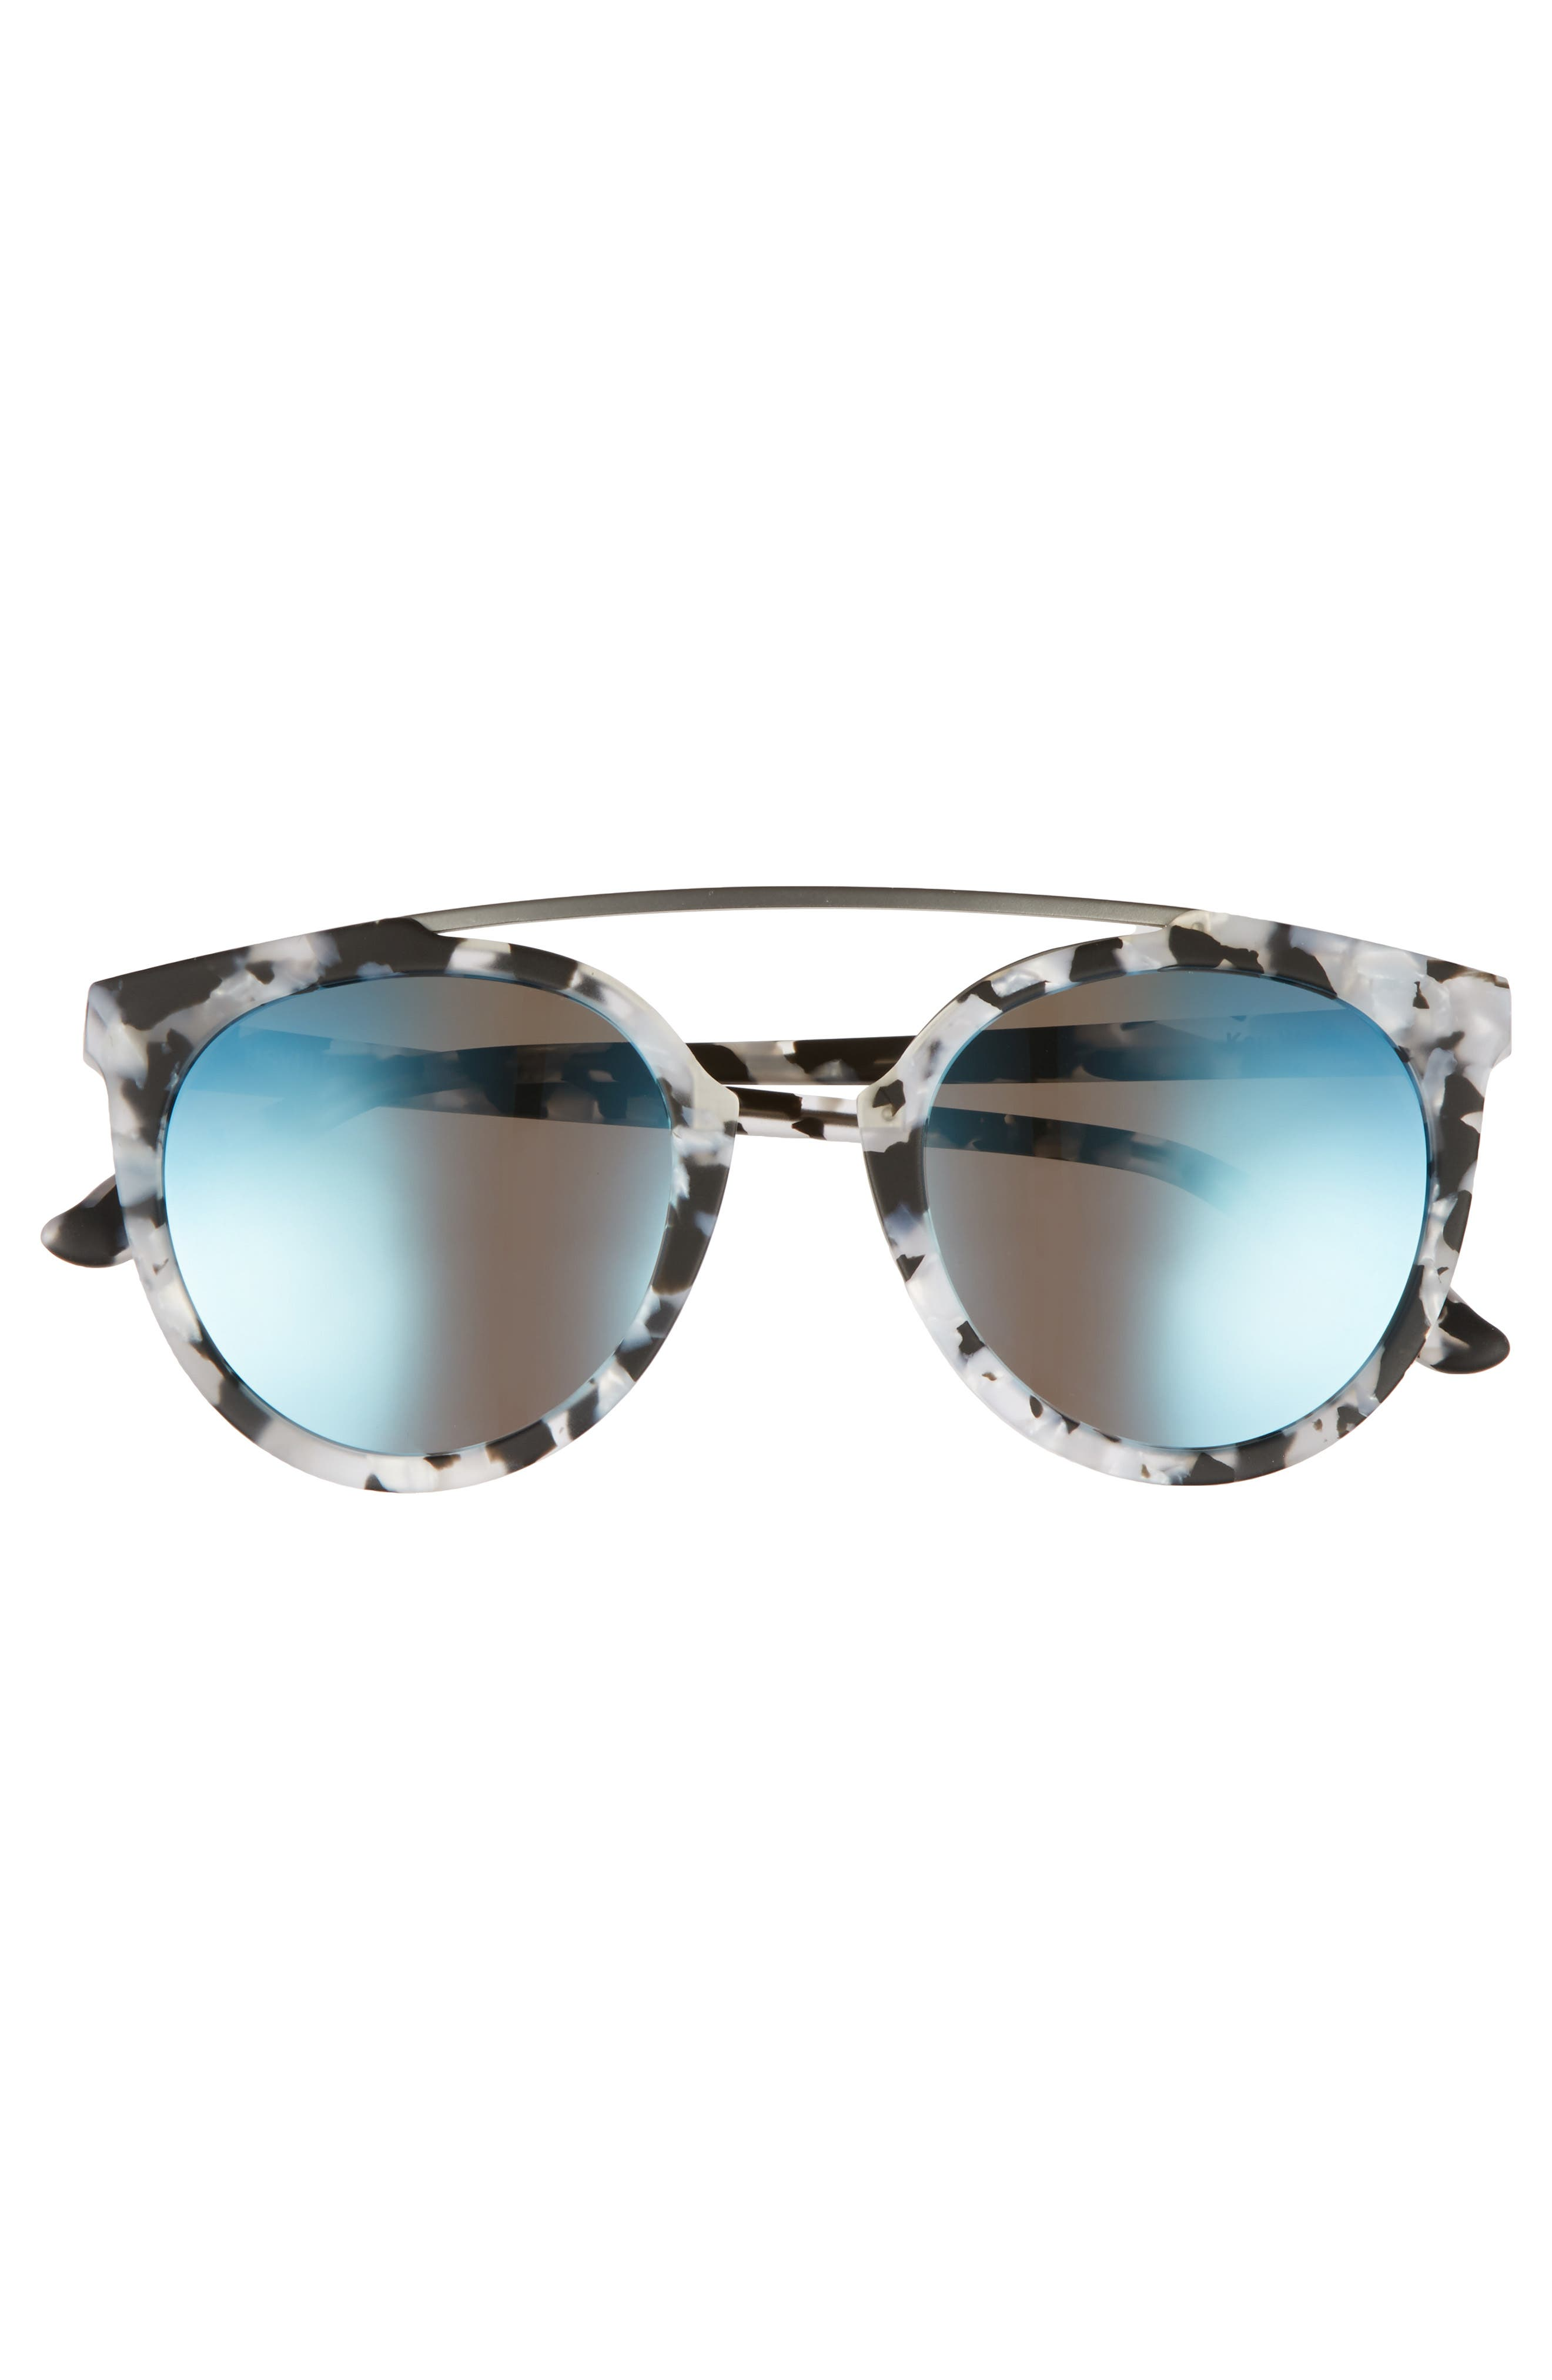 Key West 50mm Polarized Aviator Sunglasses,                             Alternate thumbnail 3, color,                             Marble